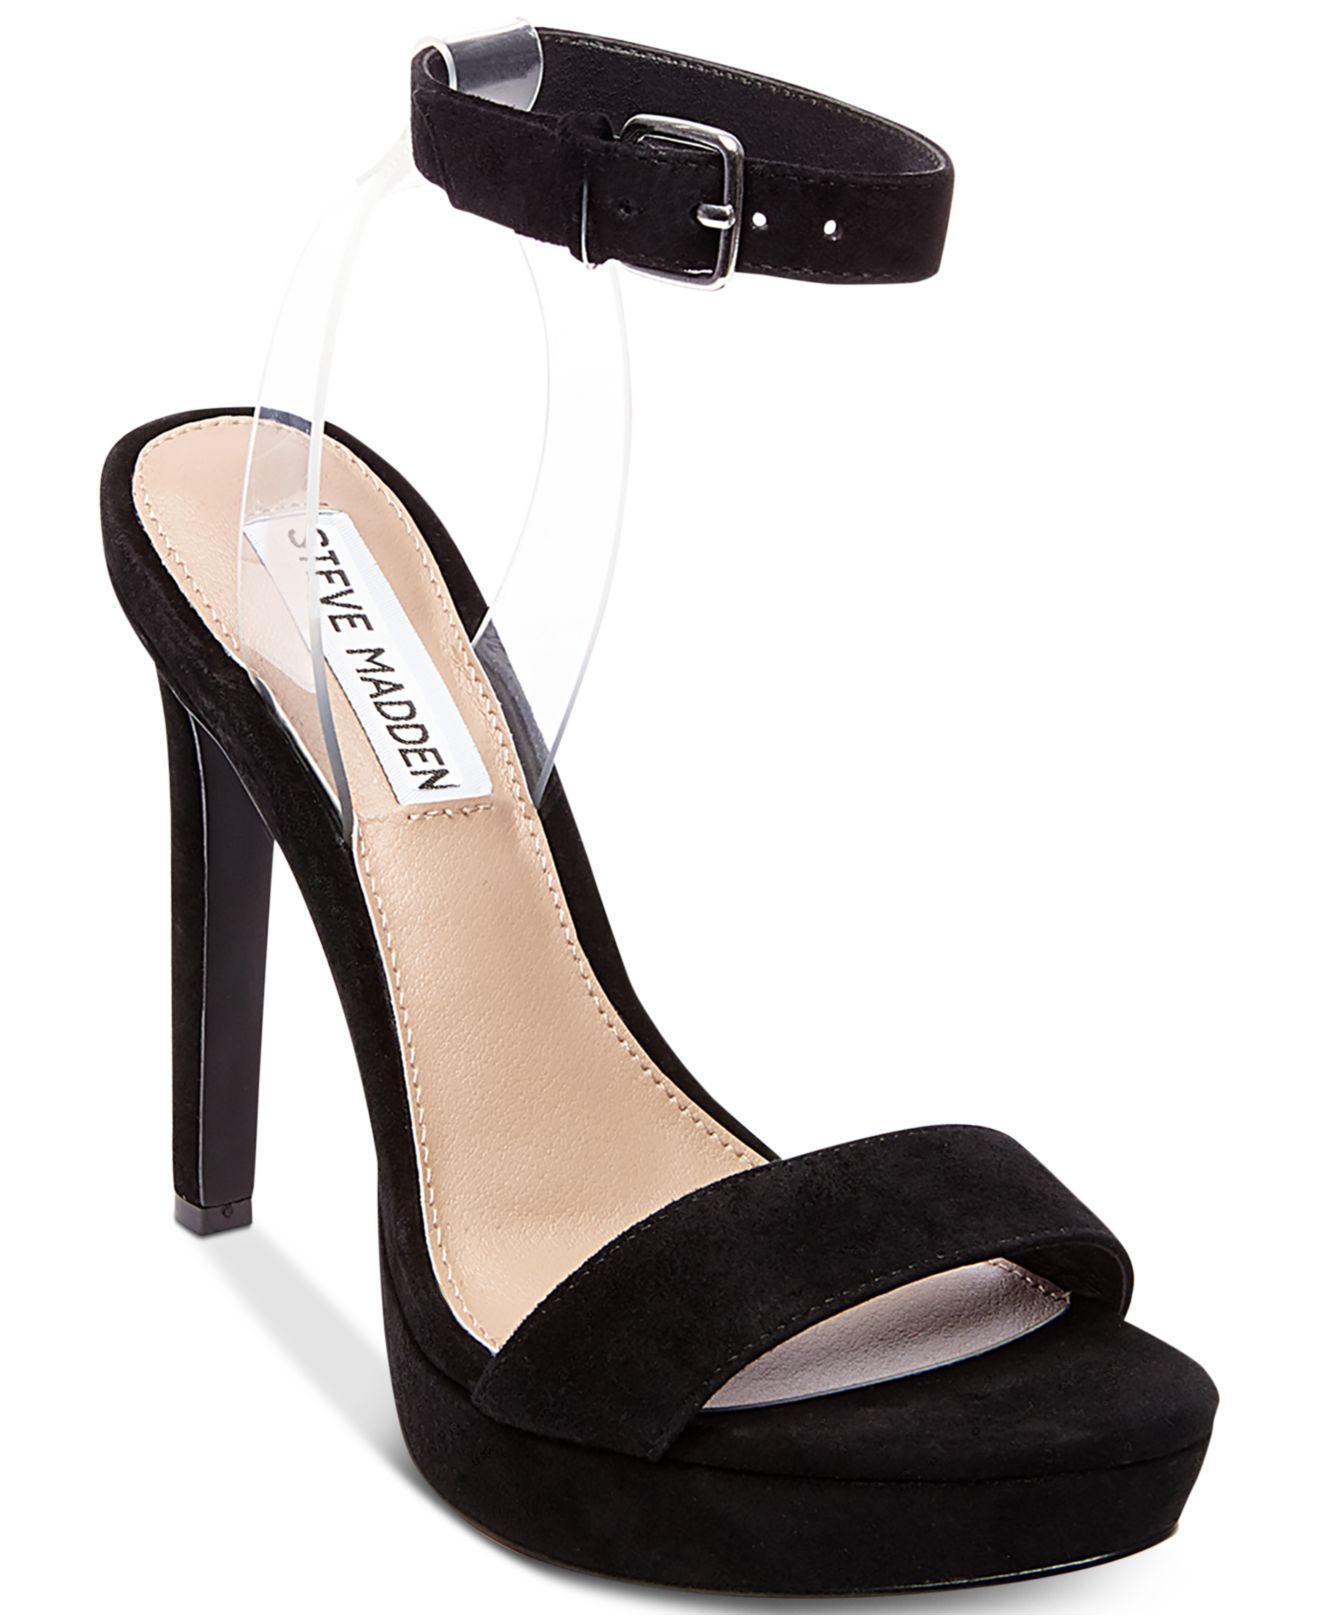 2e22fc47b810cc Steve Madden Women s Casita Two-piece Dress Sandals in Black - Lyst